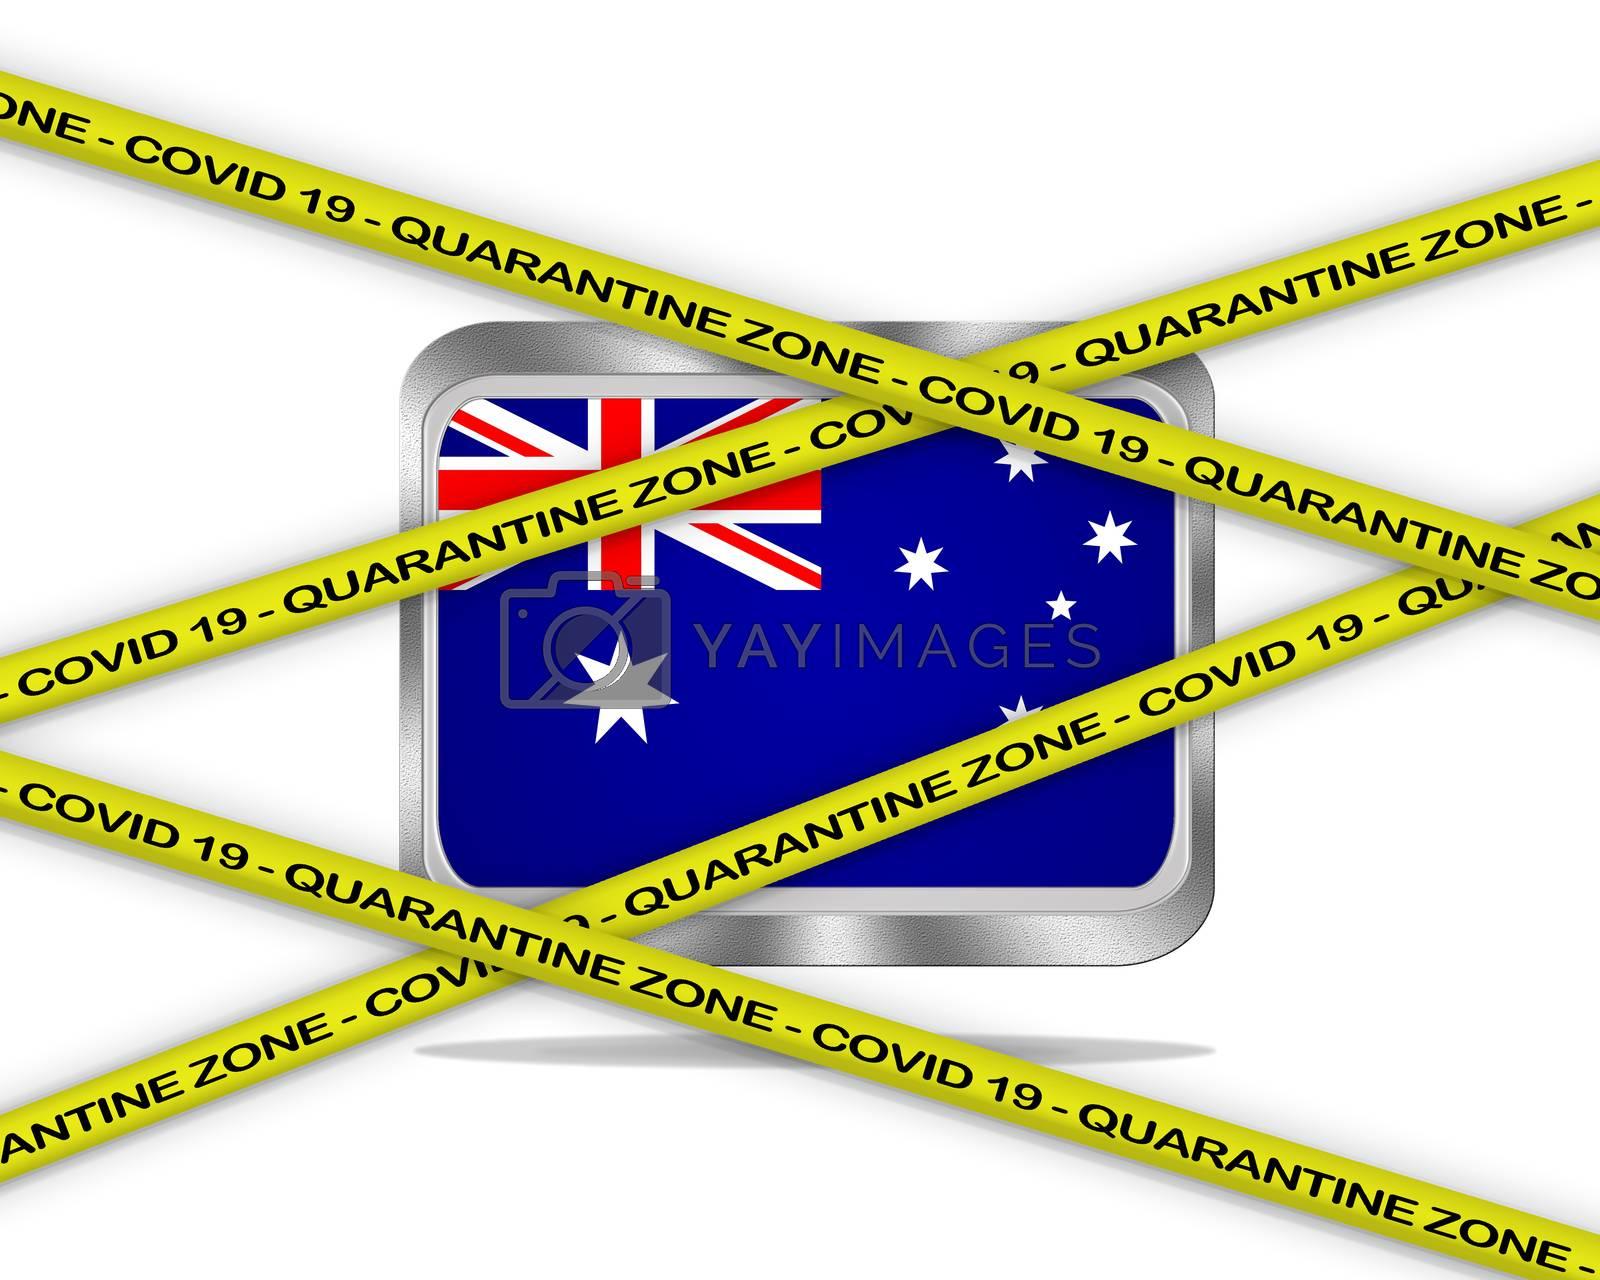 COVID-19 warning yellow ribbon written with: Quarantine zone Cover 19 on Australia flag illustration. Coronavirus danger area, quarantined country.